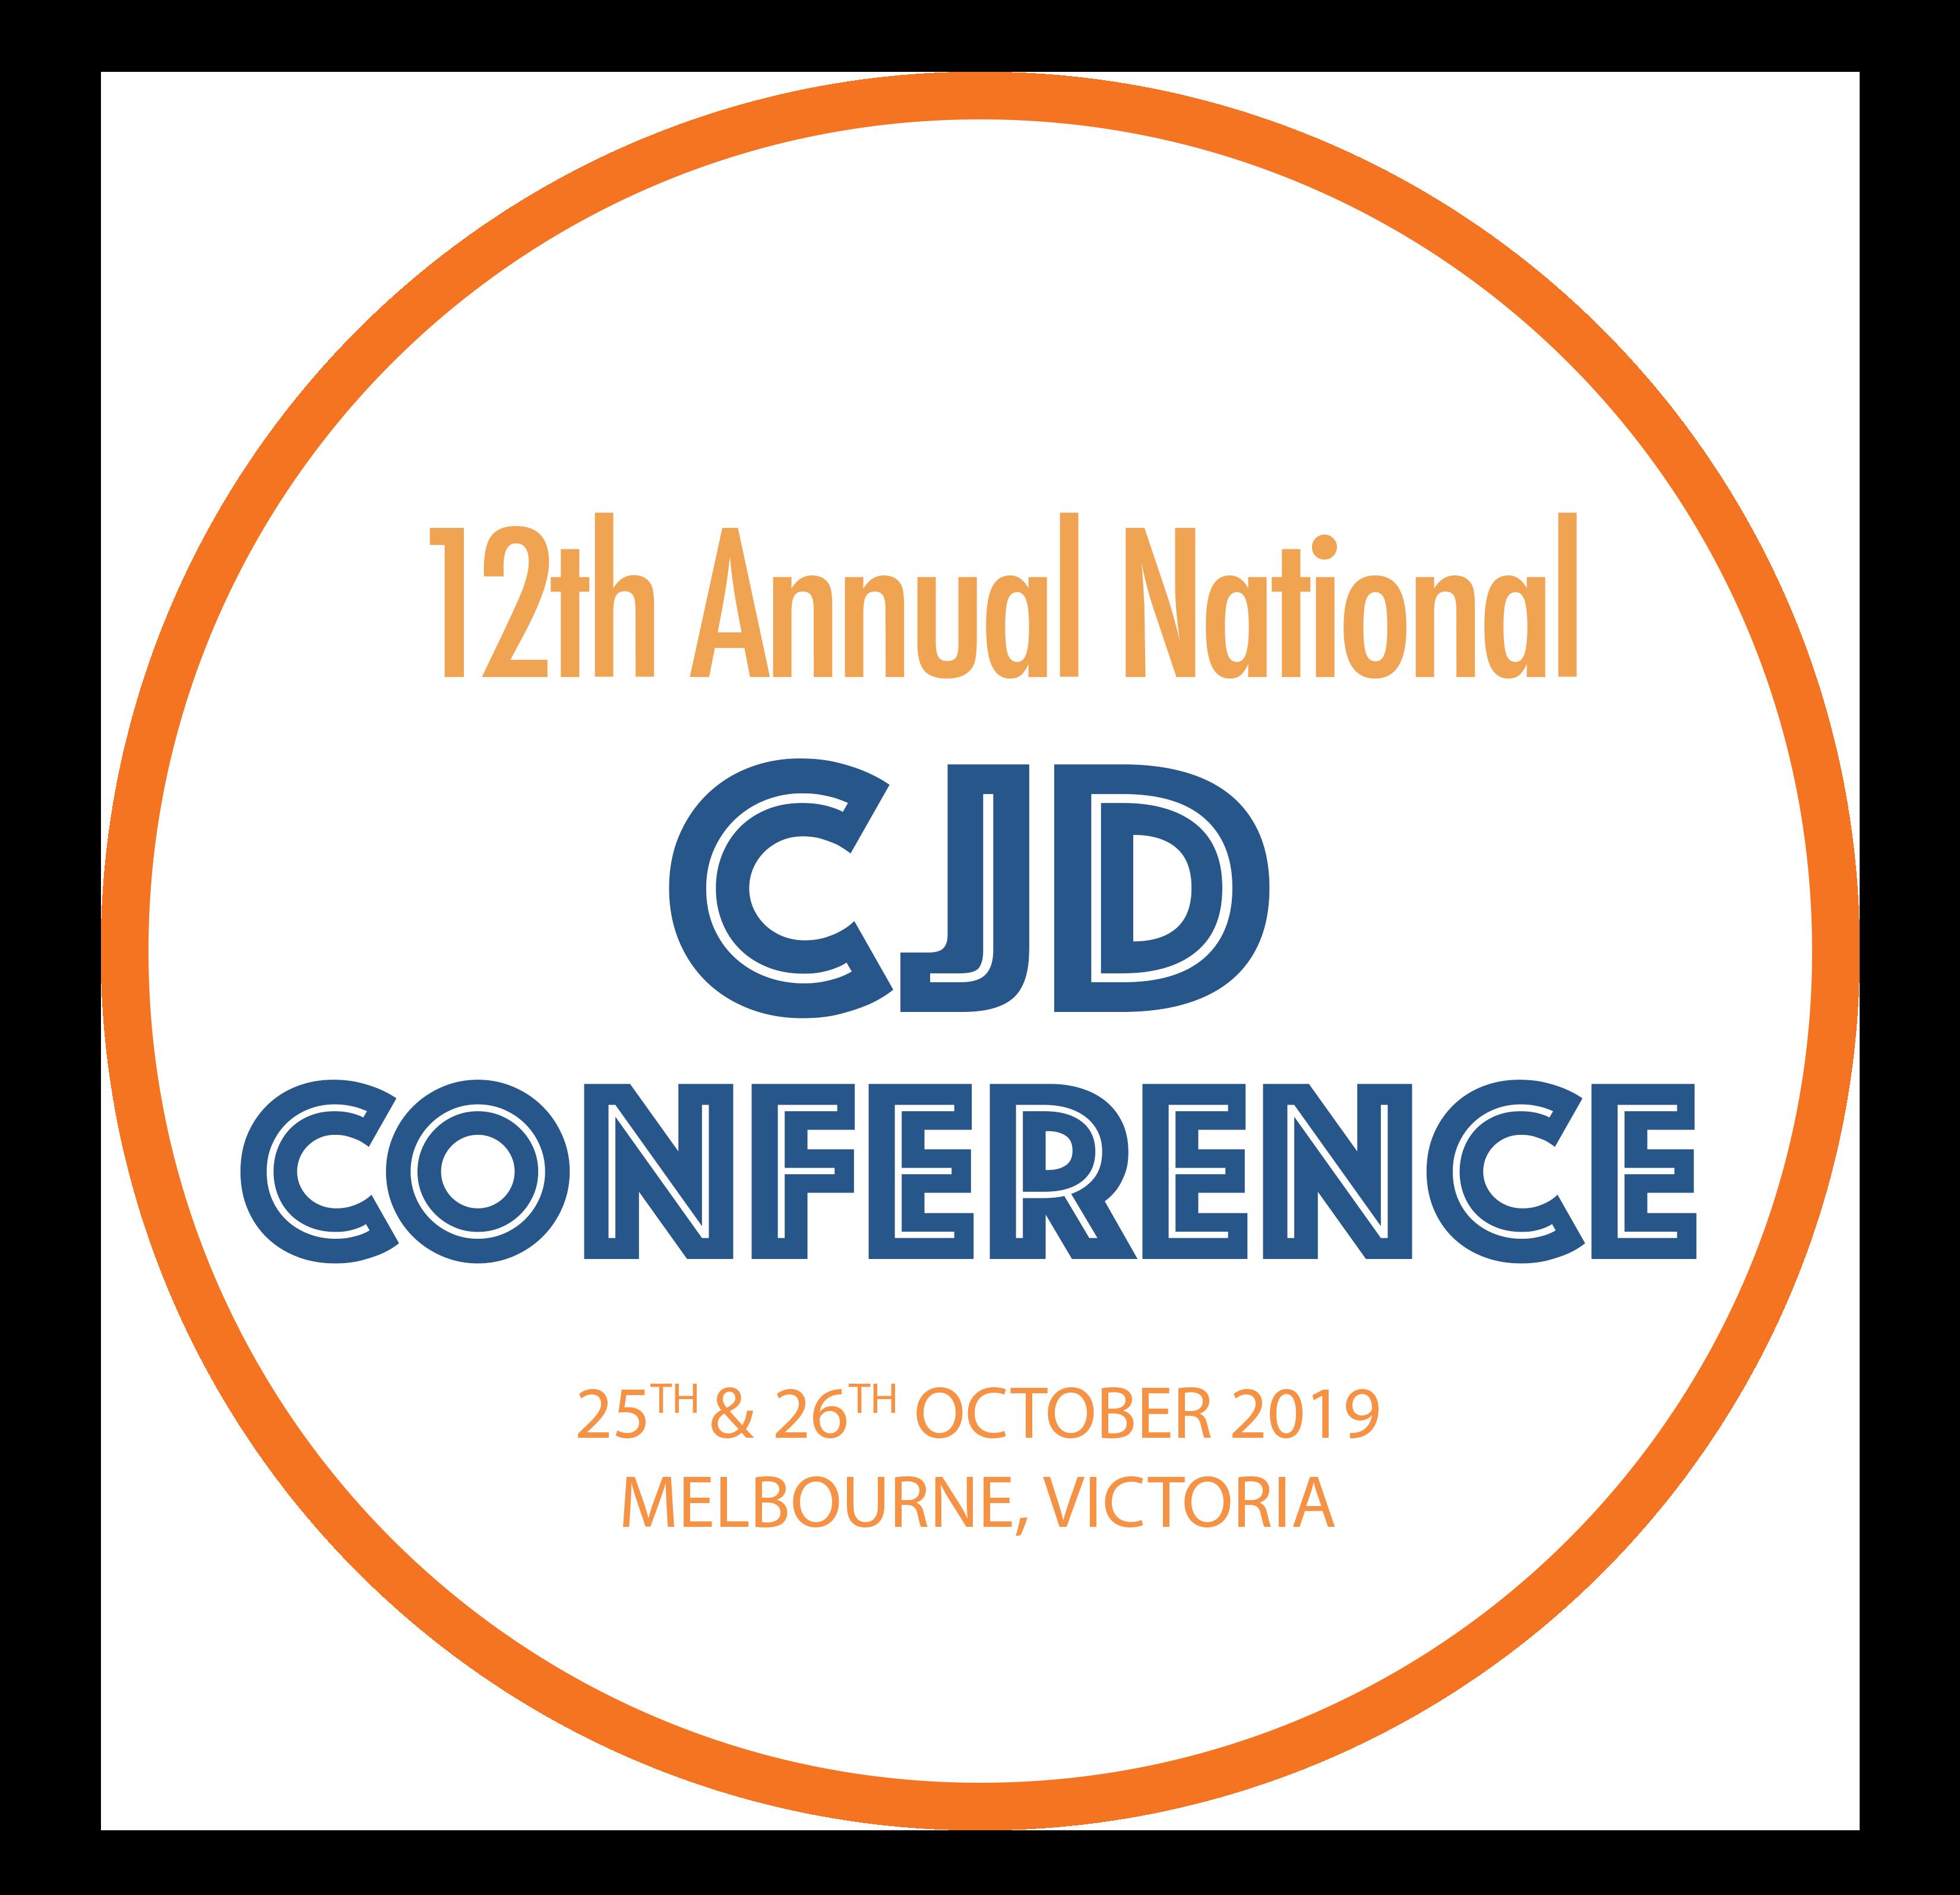 CJDSGN Australia National Conference